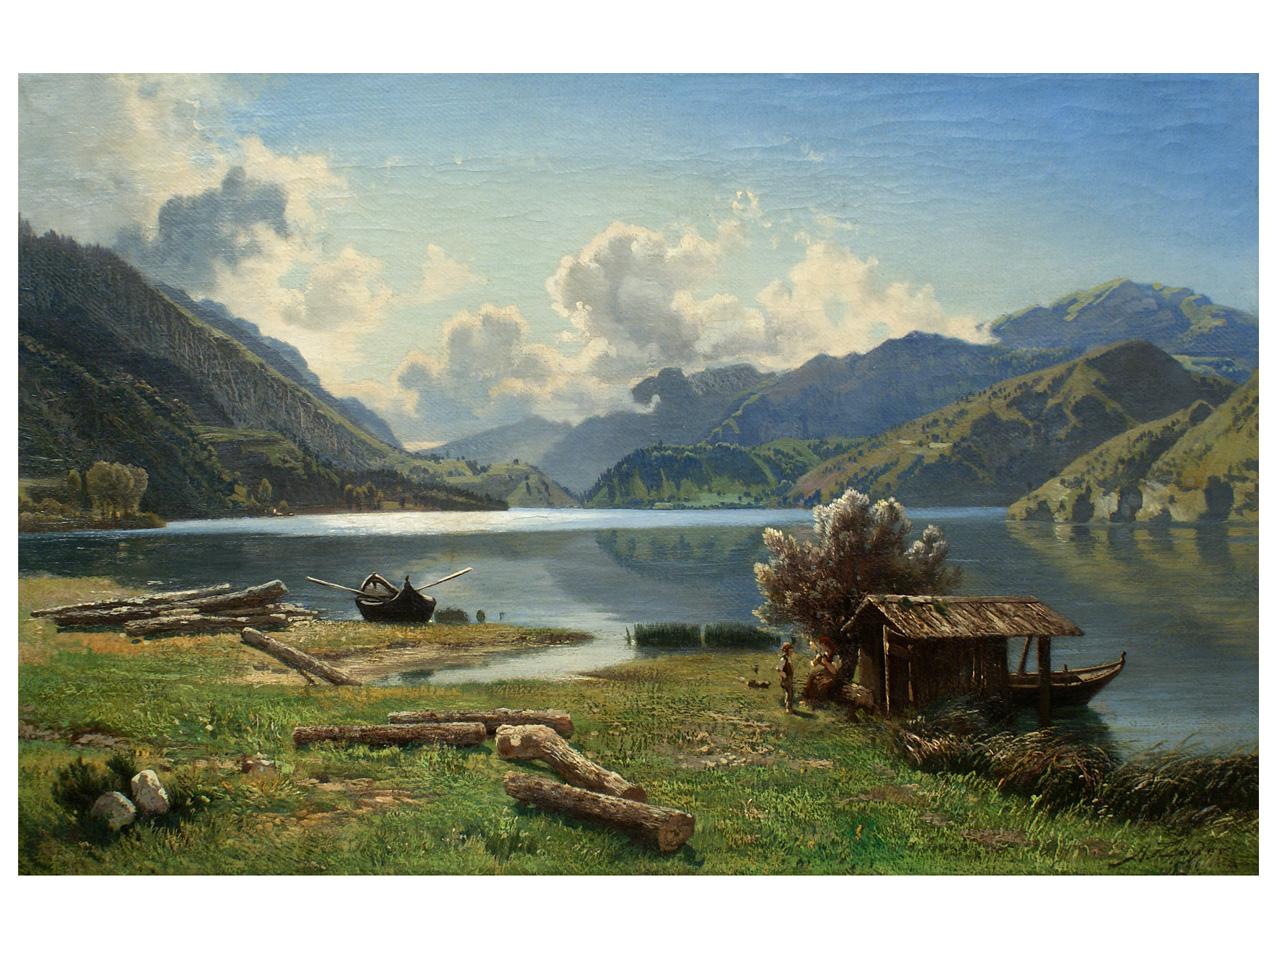 Landschaftsmalerei barock  Art.Nr. G 50 Ziegler, Andreas: Ölgemälde, Landschaftsmalerei, 2 ...